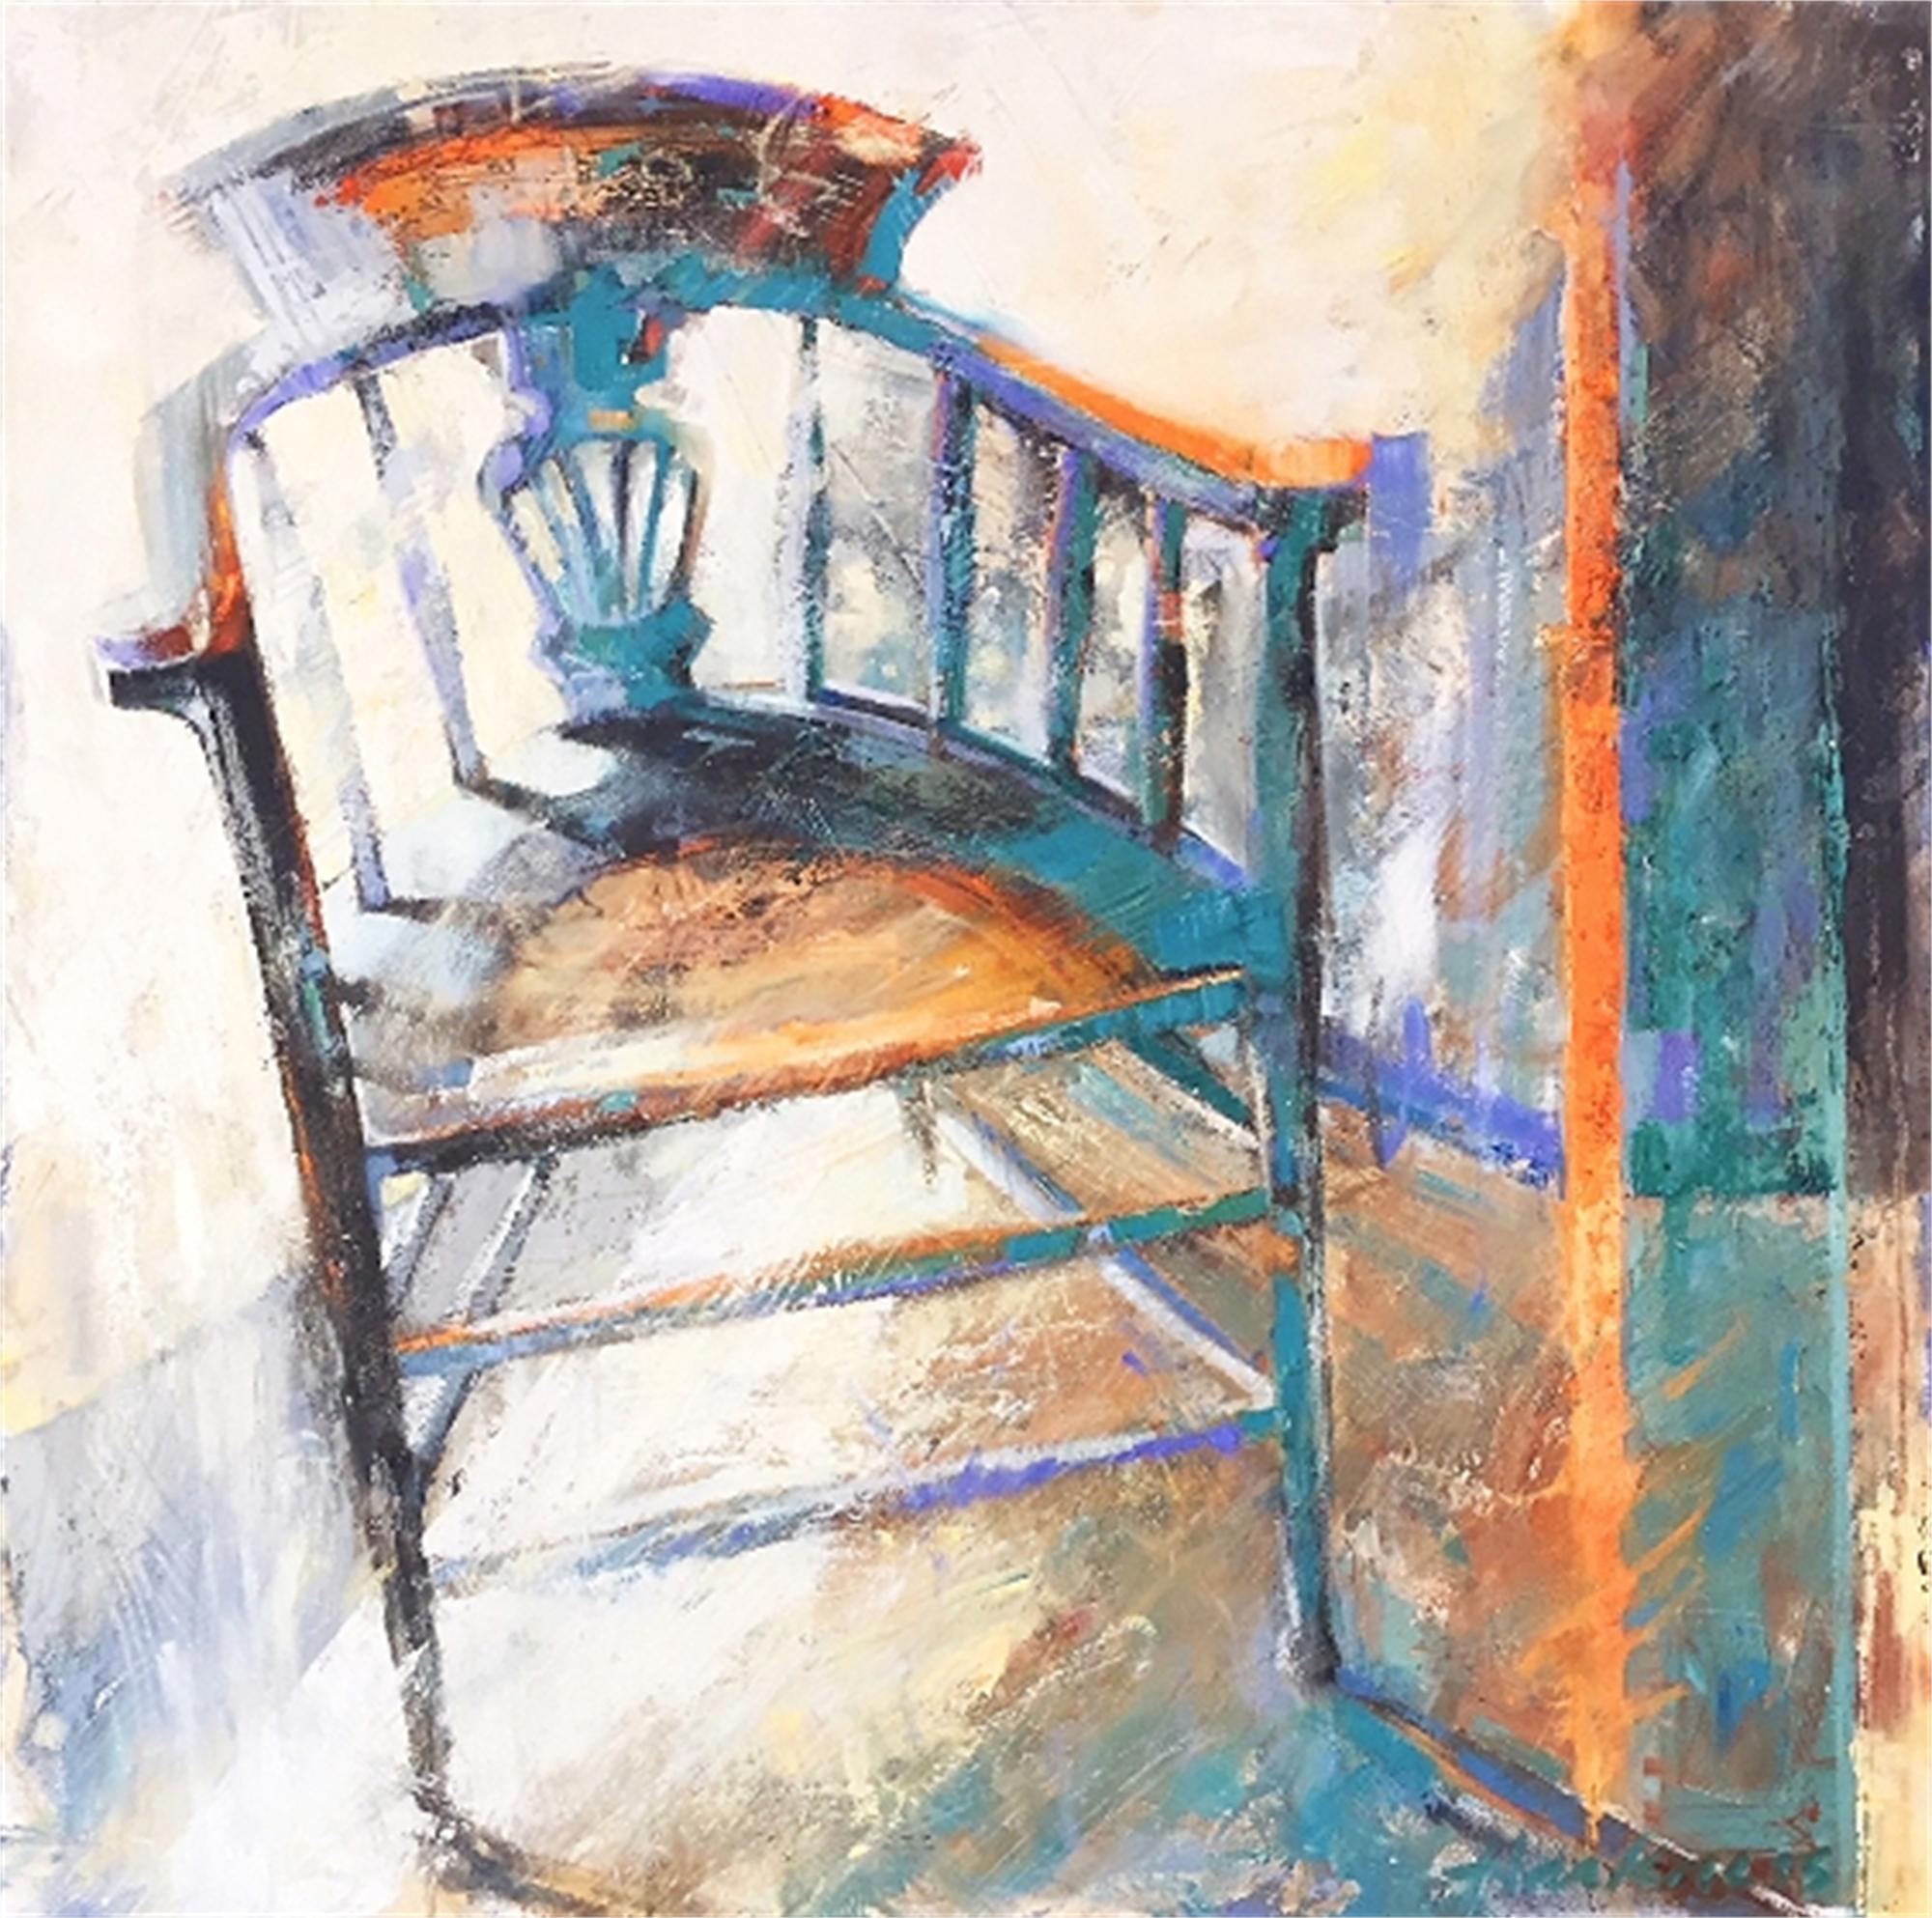 Sittin' Pretty by Anne Harkness